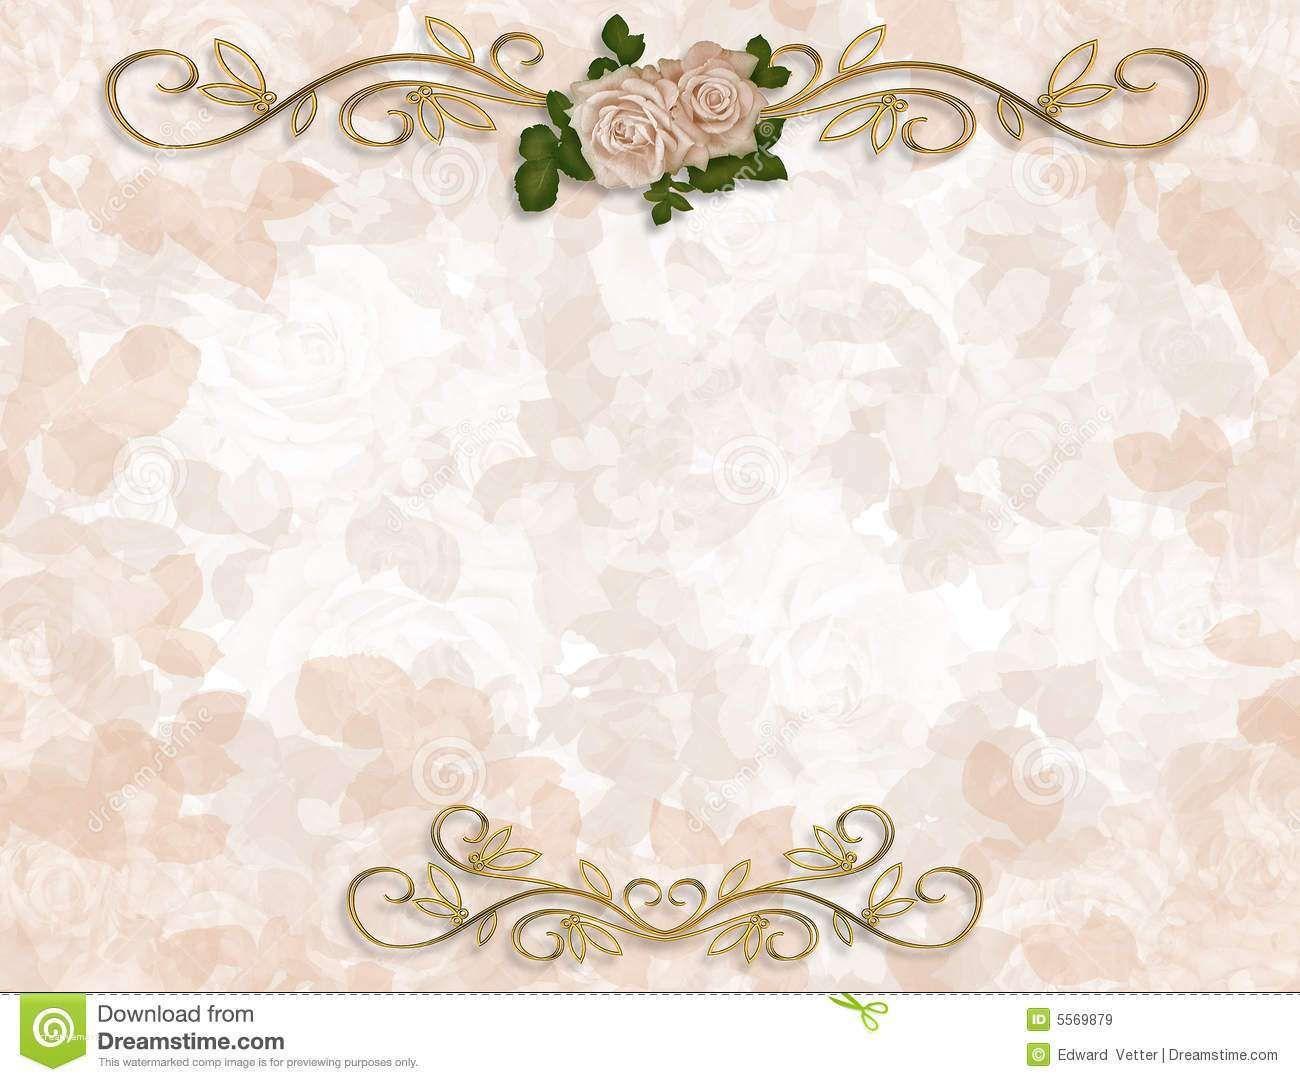 Fresh Wedding Invitation Background Designs Free Download | Floral ...